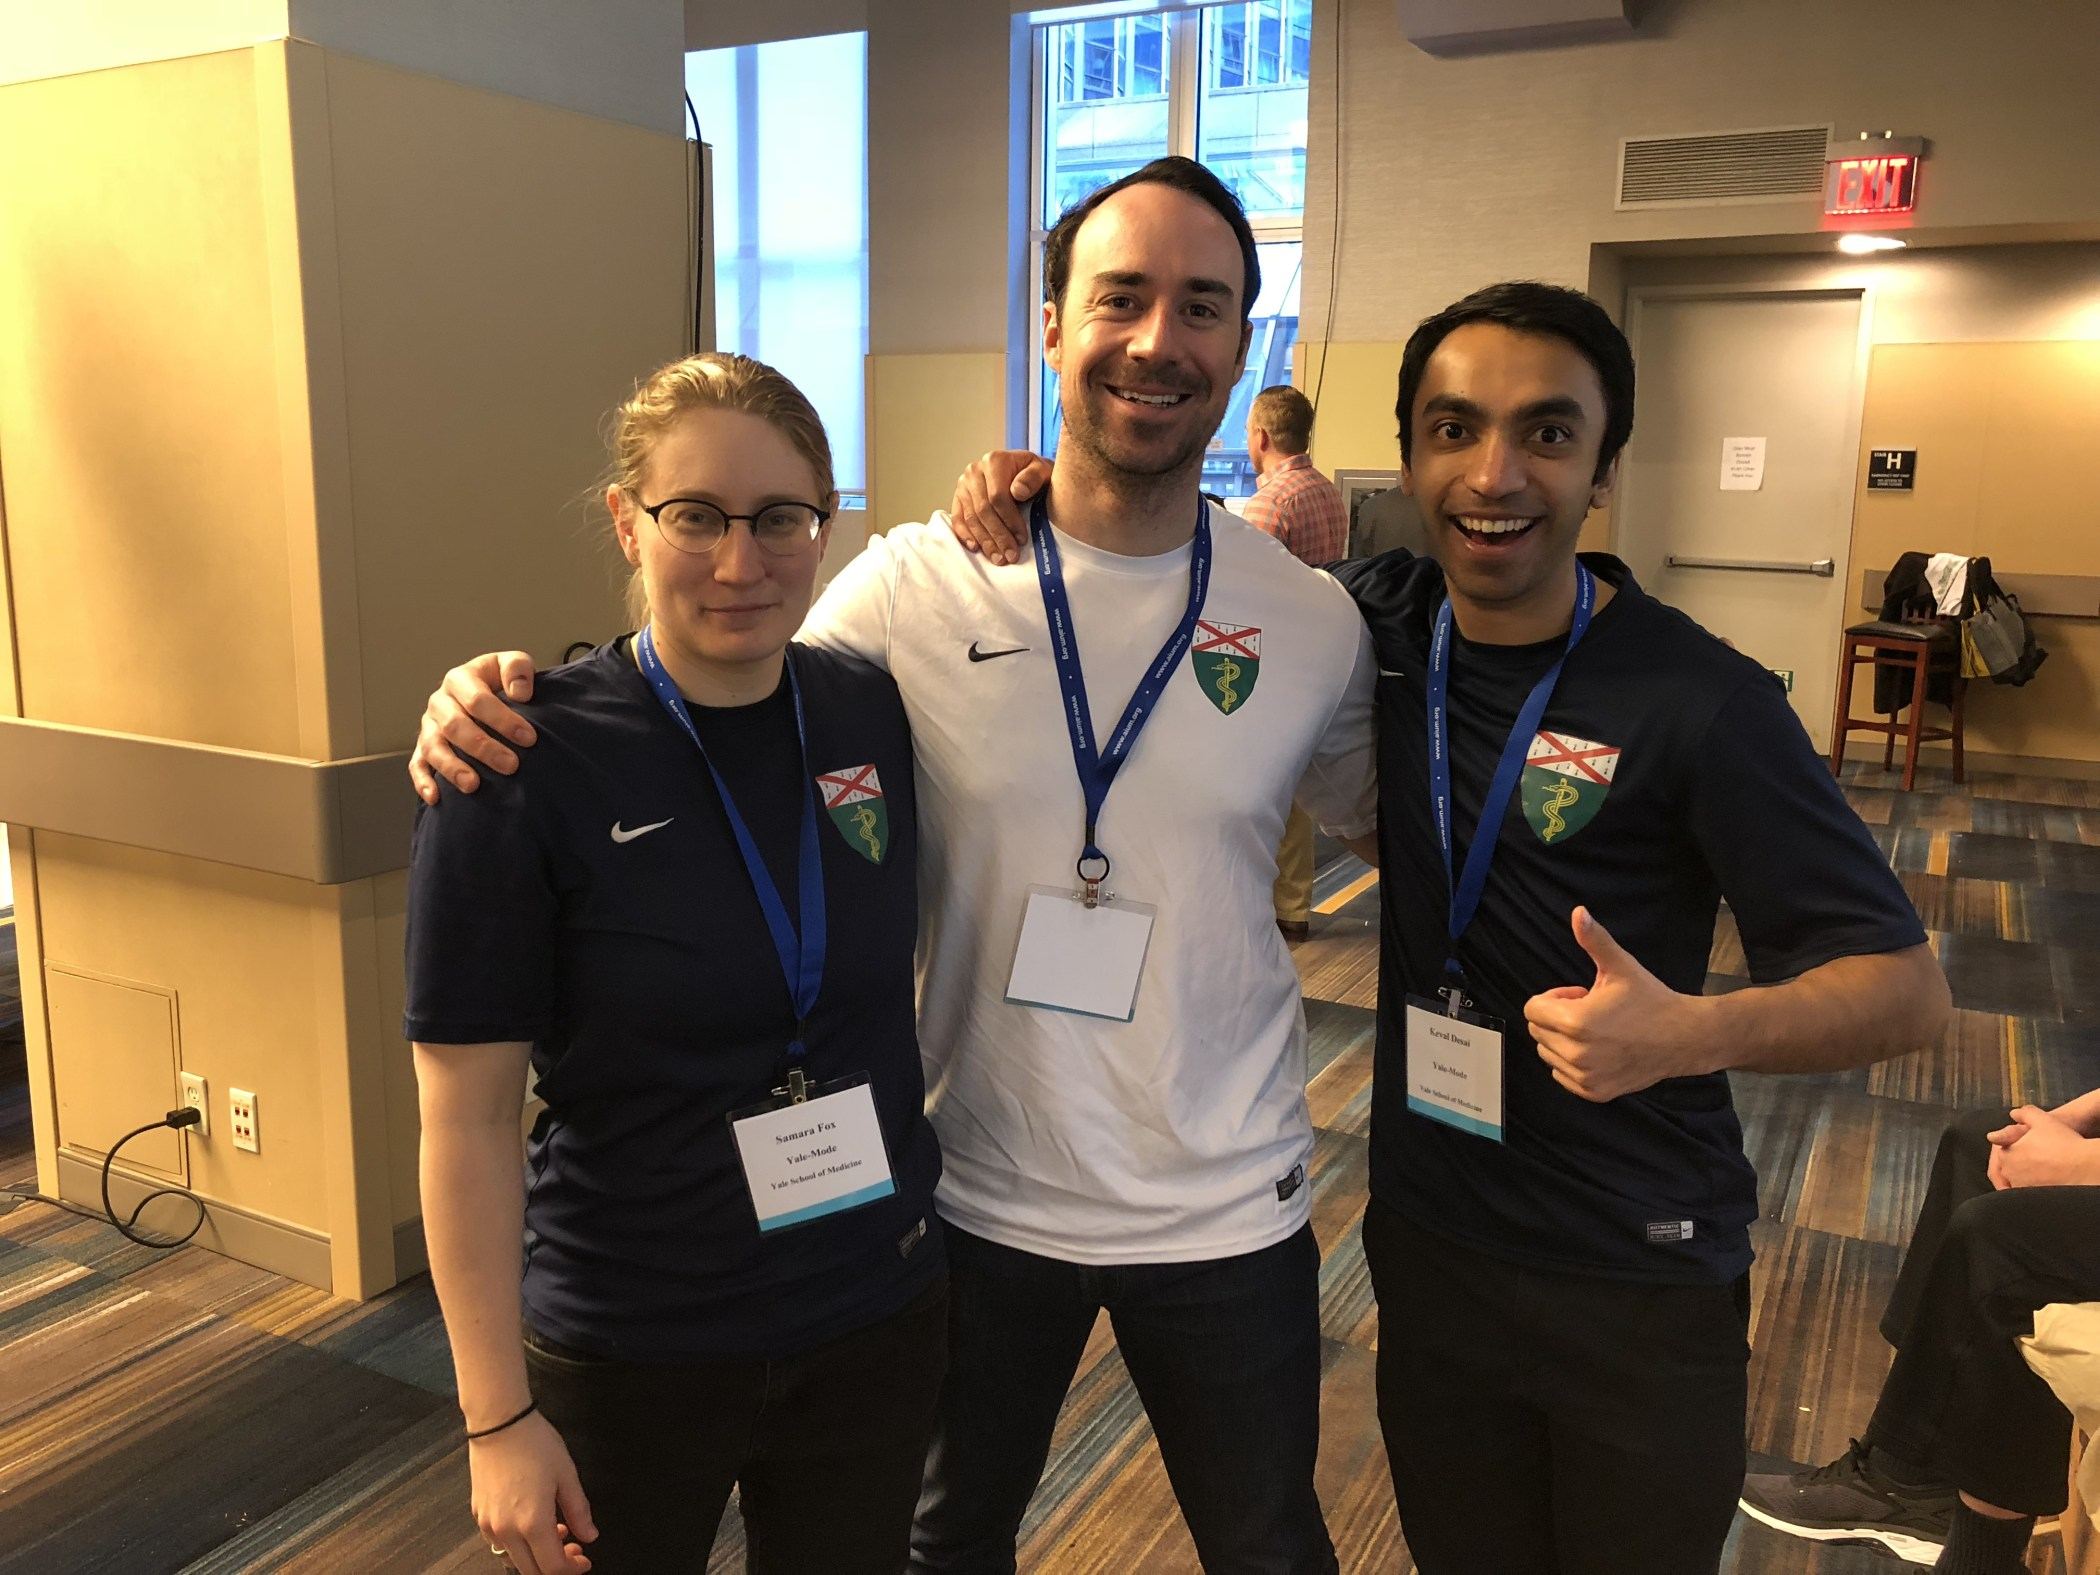 Yale School of Medicine teammates Samara Fox, Michael Boyle, and Keval Desai